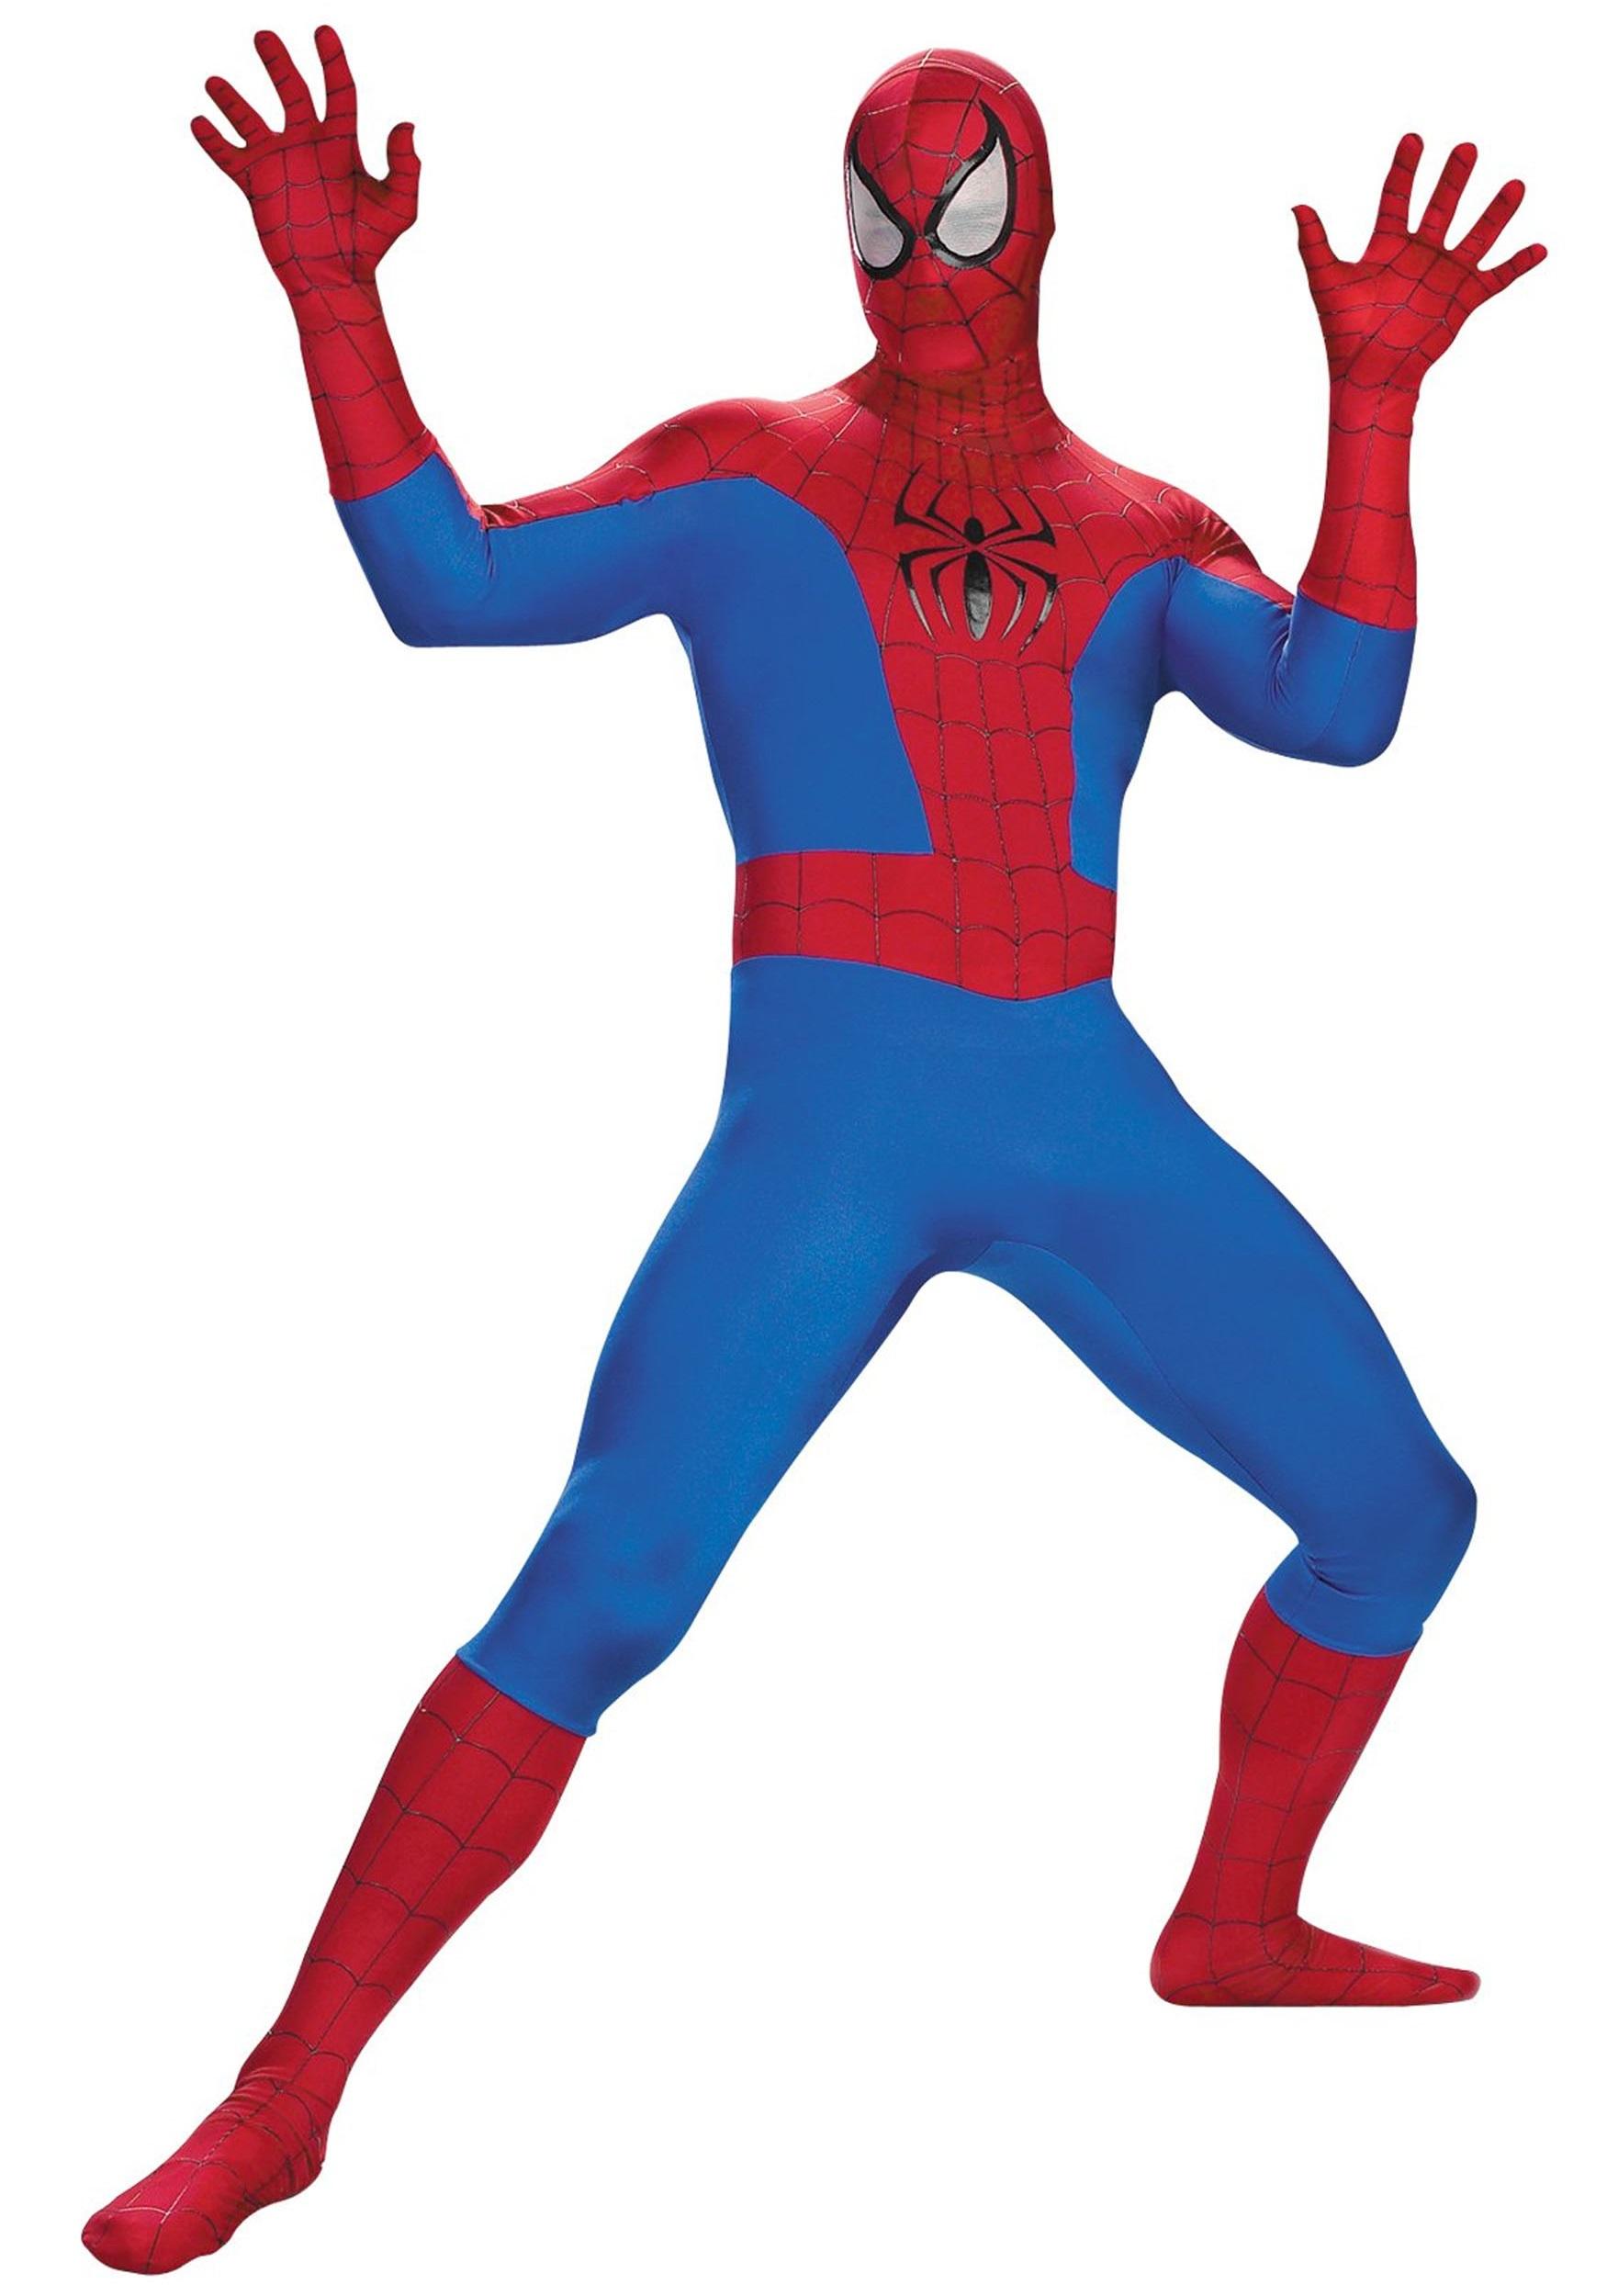 Spiderman clipart show me Costumes Realistic Teen HalloweenCostumes Spiderman